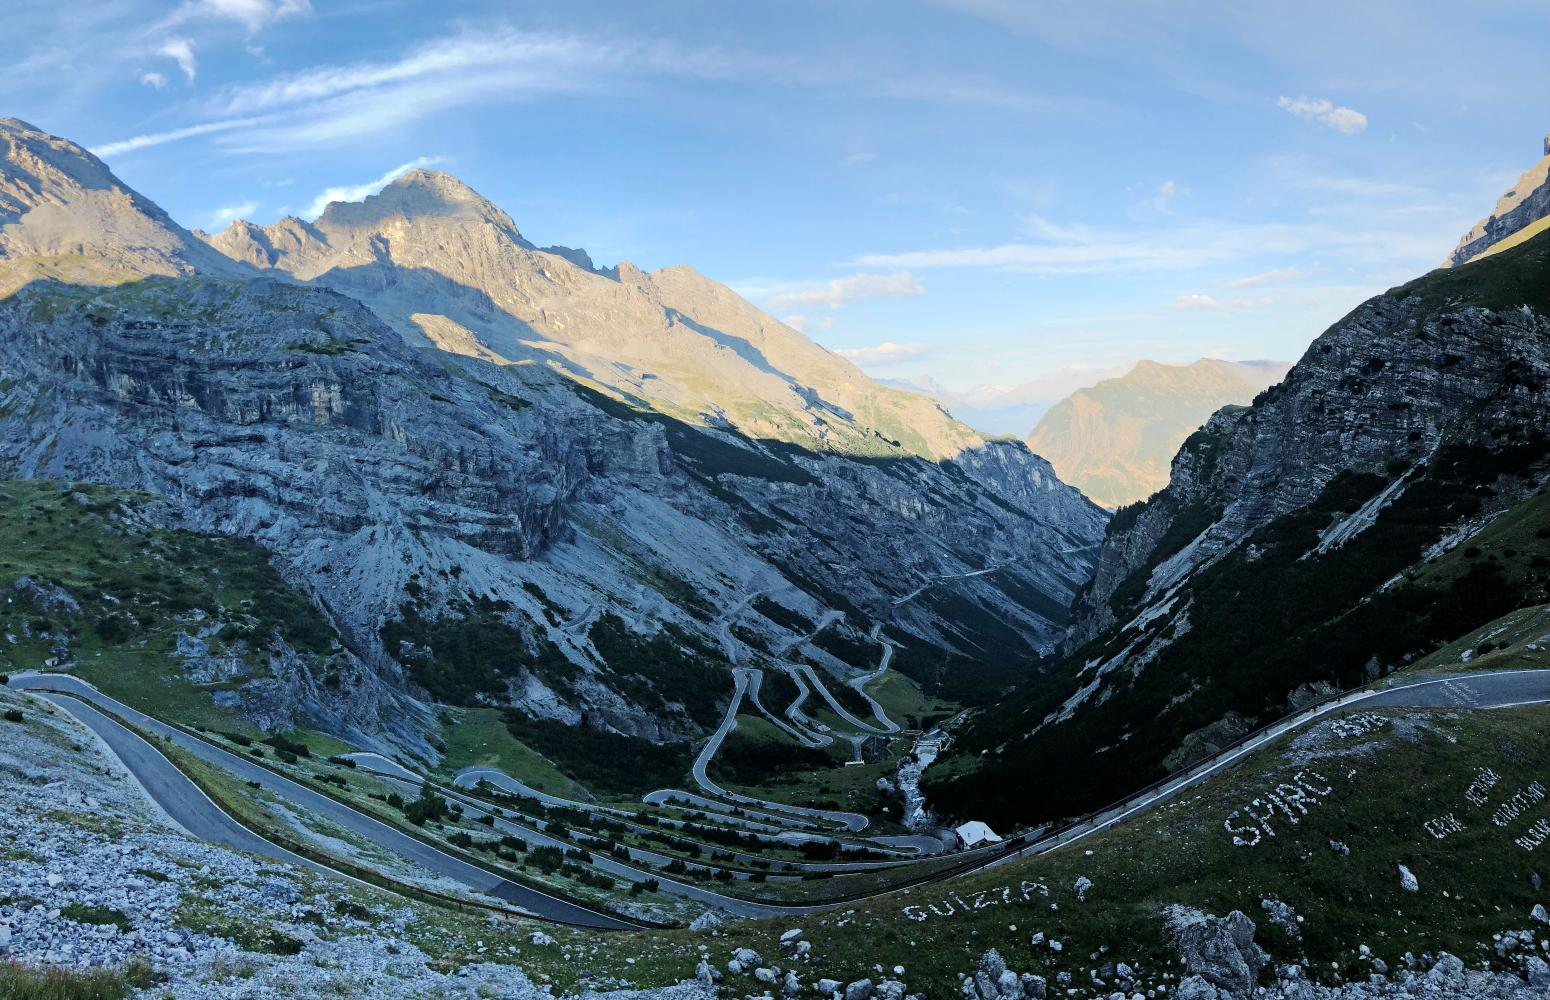 Passo dello Stelvio (Bormio), Italy - PJAMM Cycling - Climb of the Week